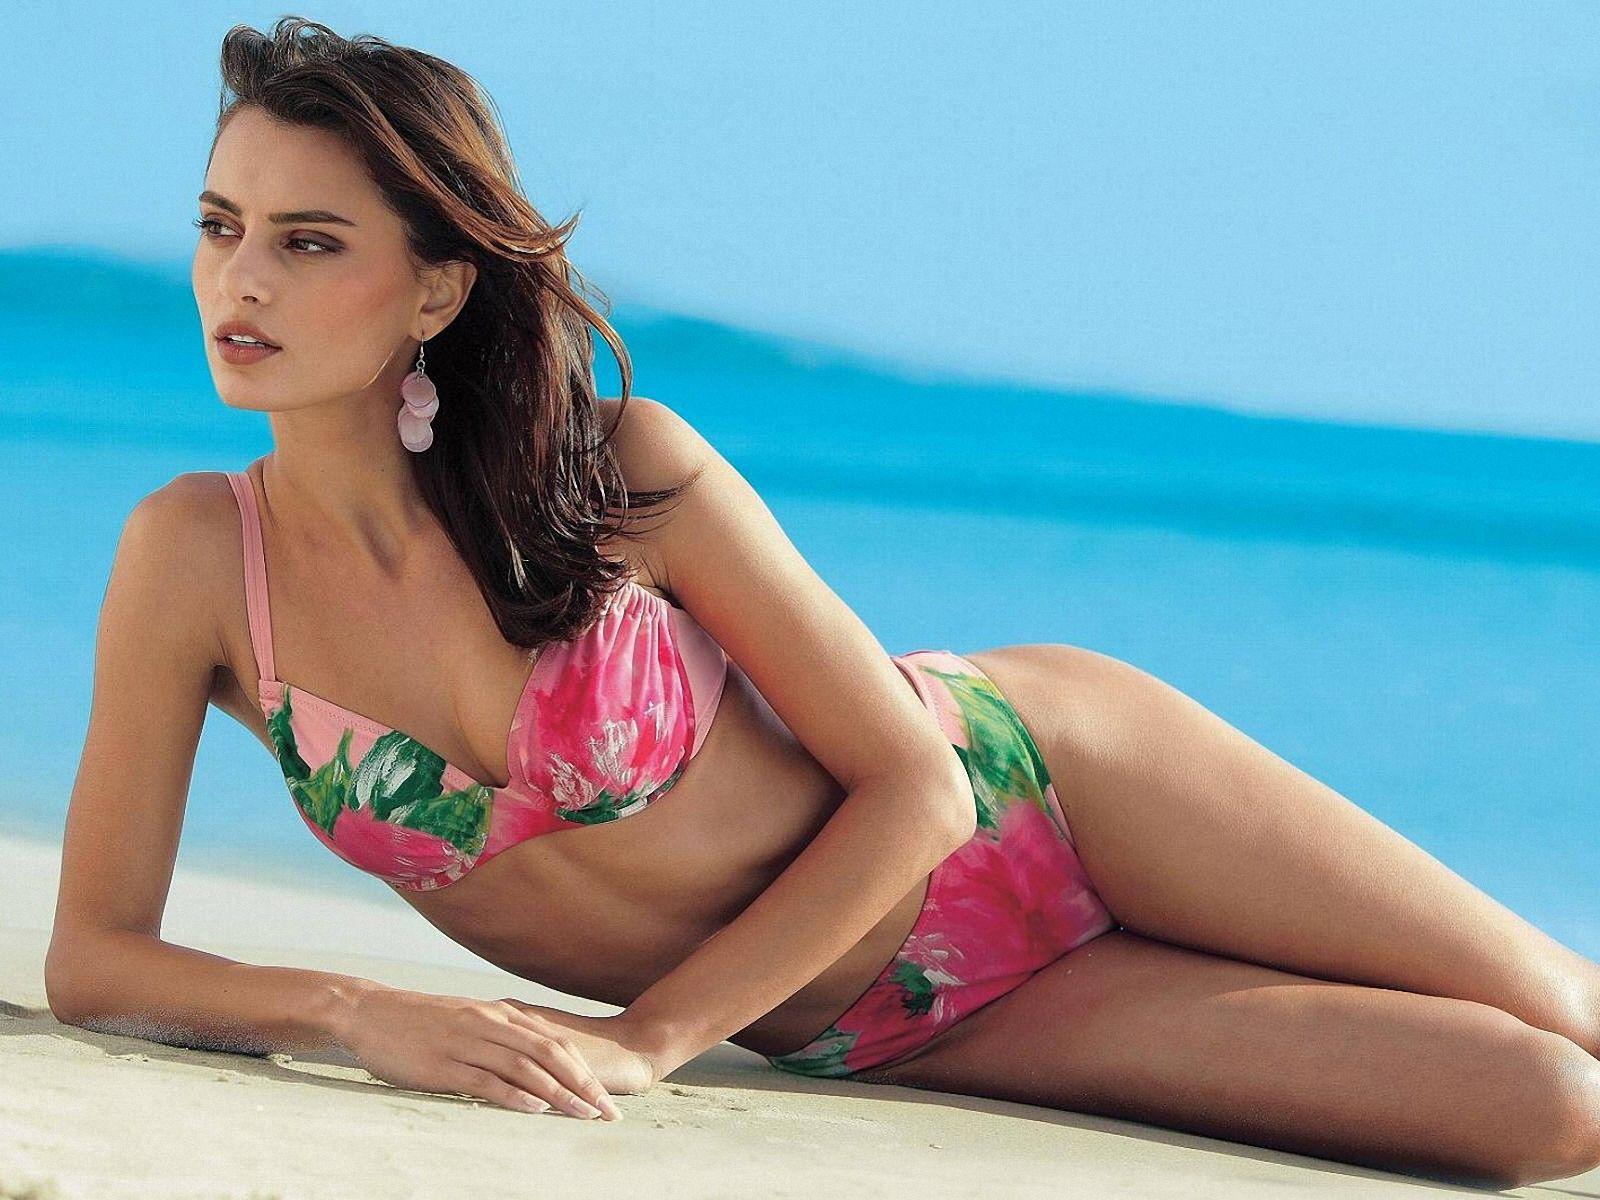 catrinel menghia in bikini wallpaper